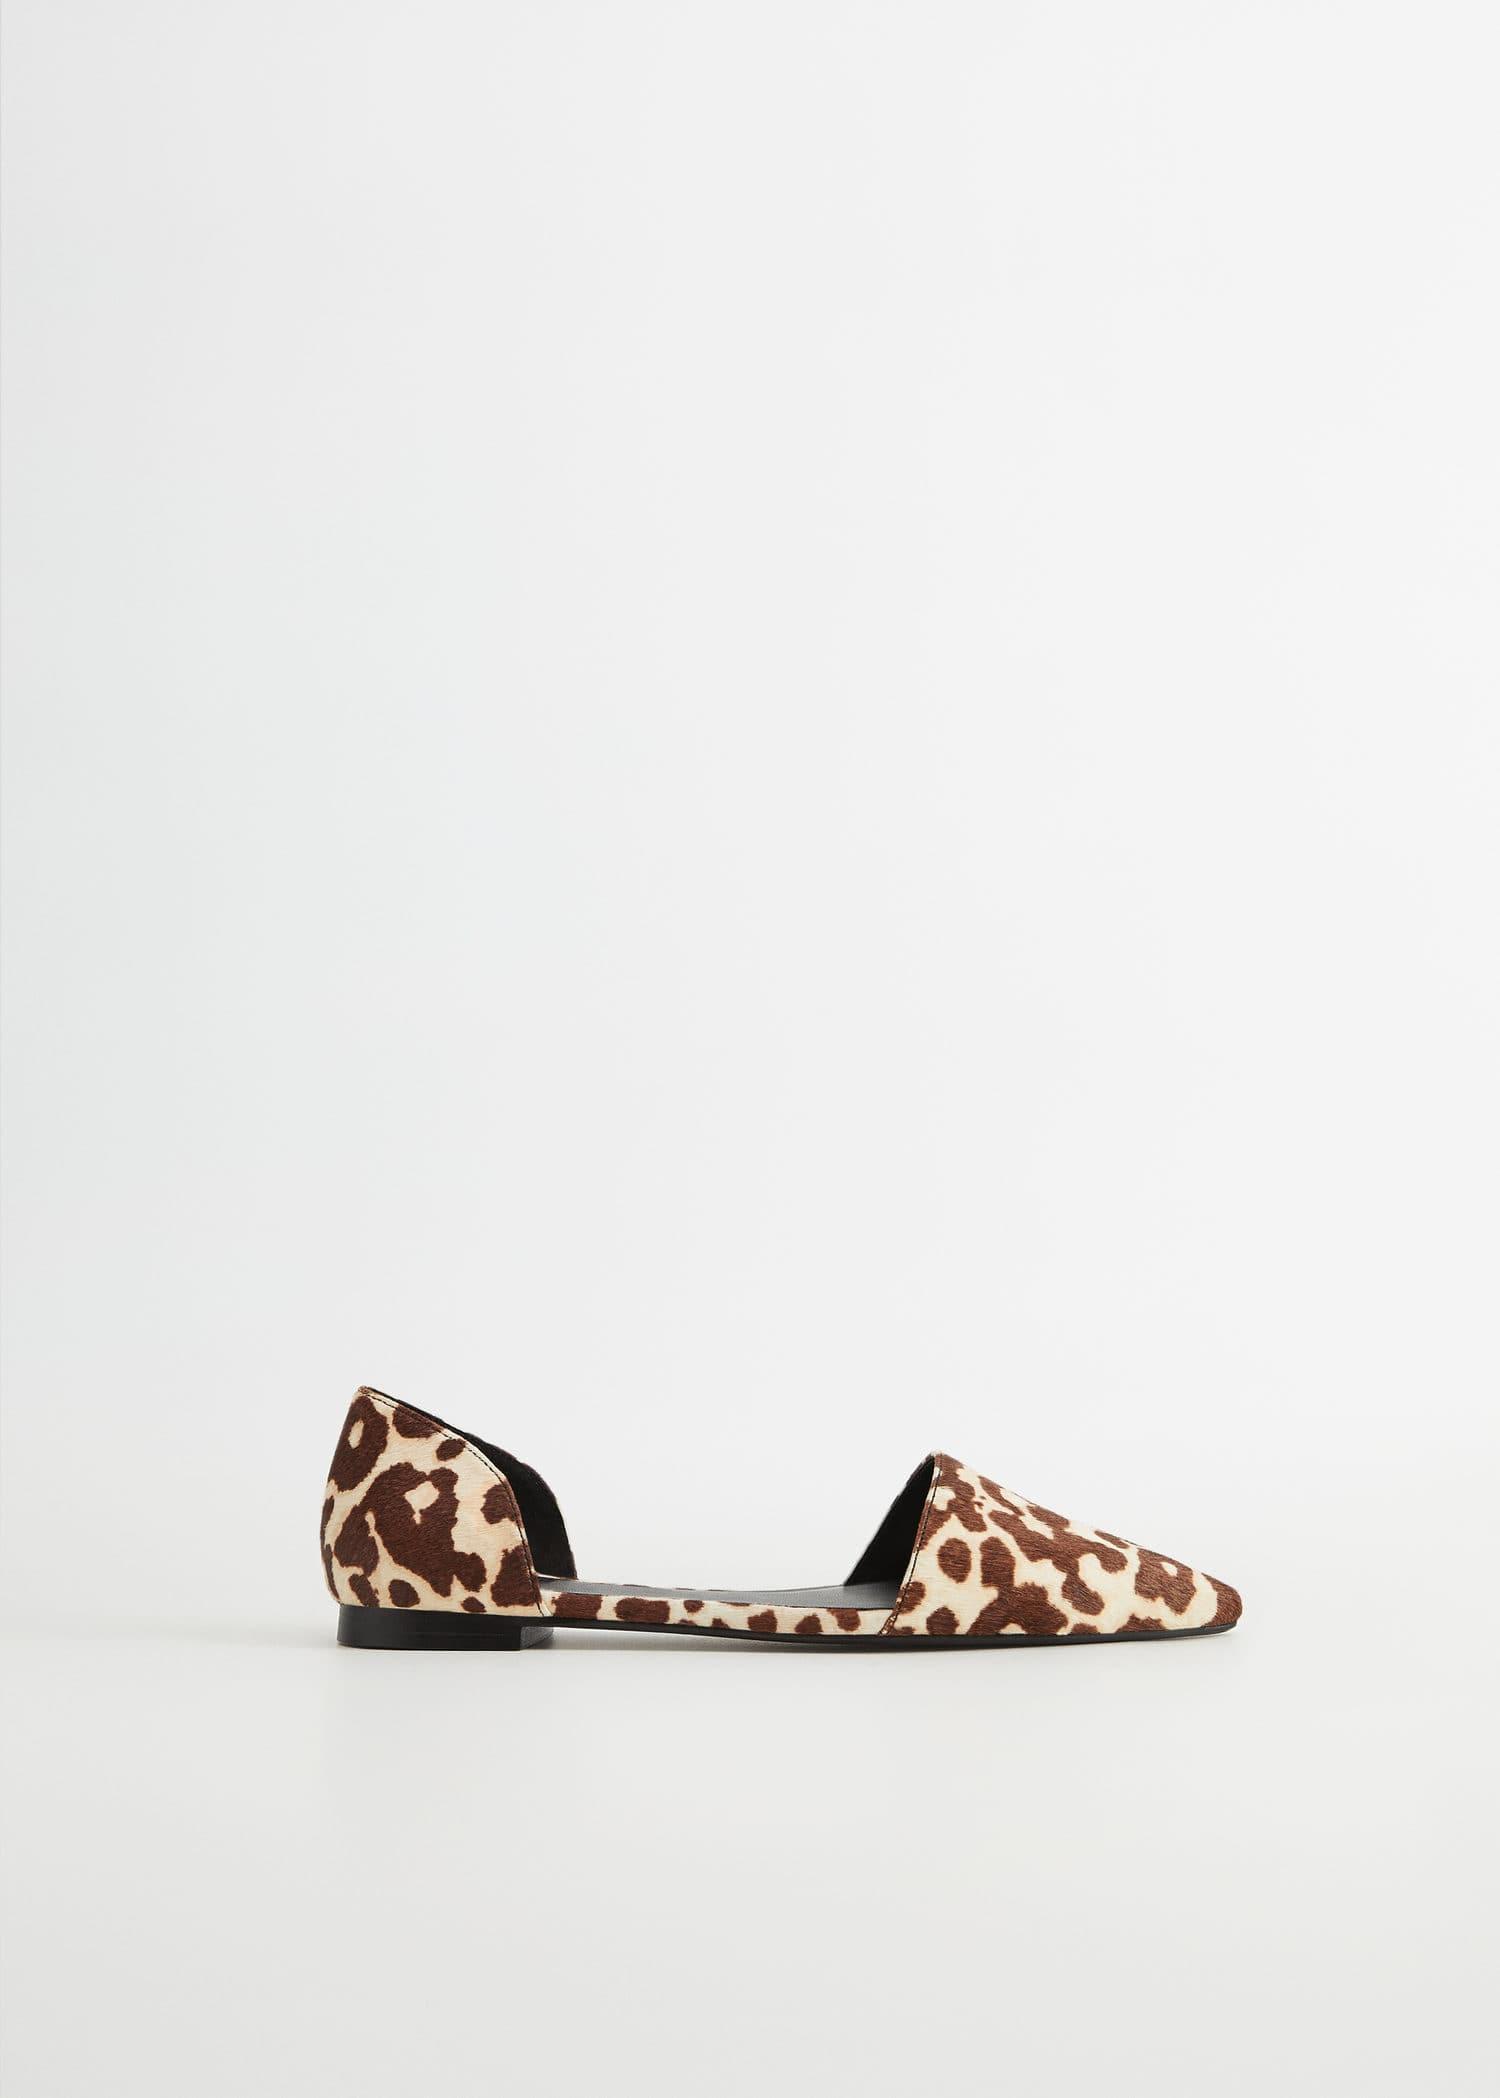 Animal print leather shoes - Plus sizes